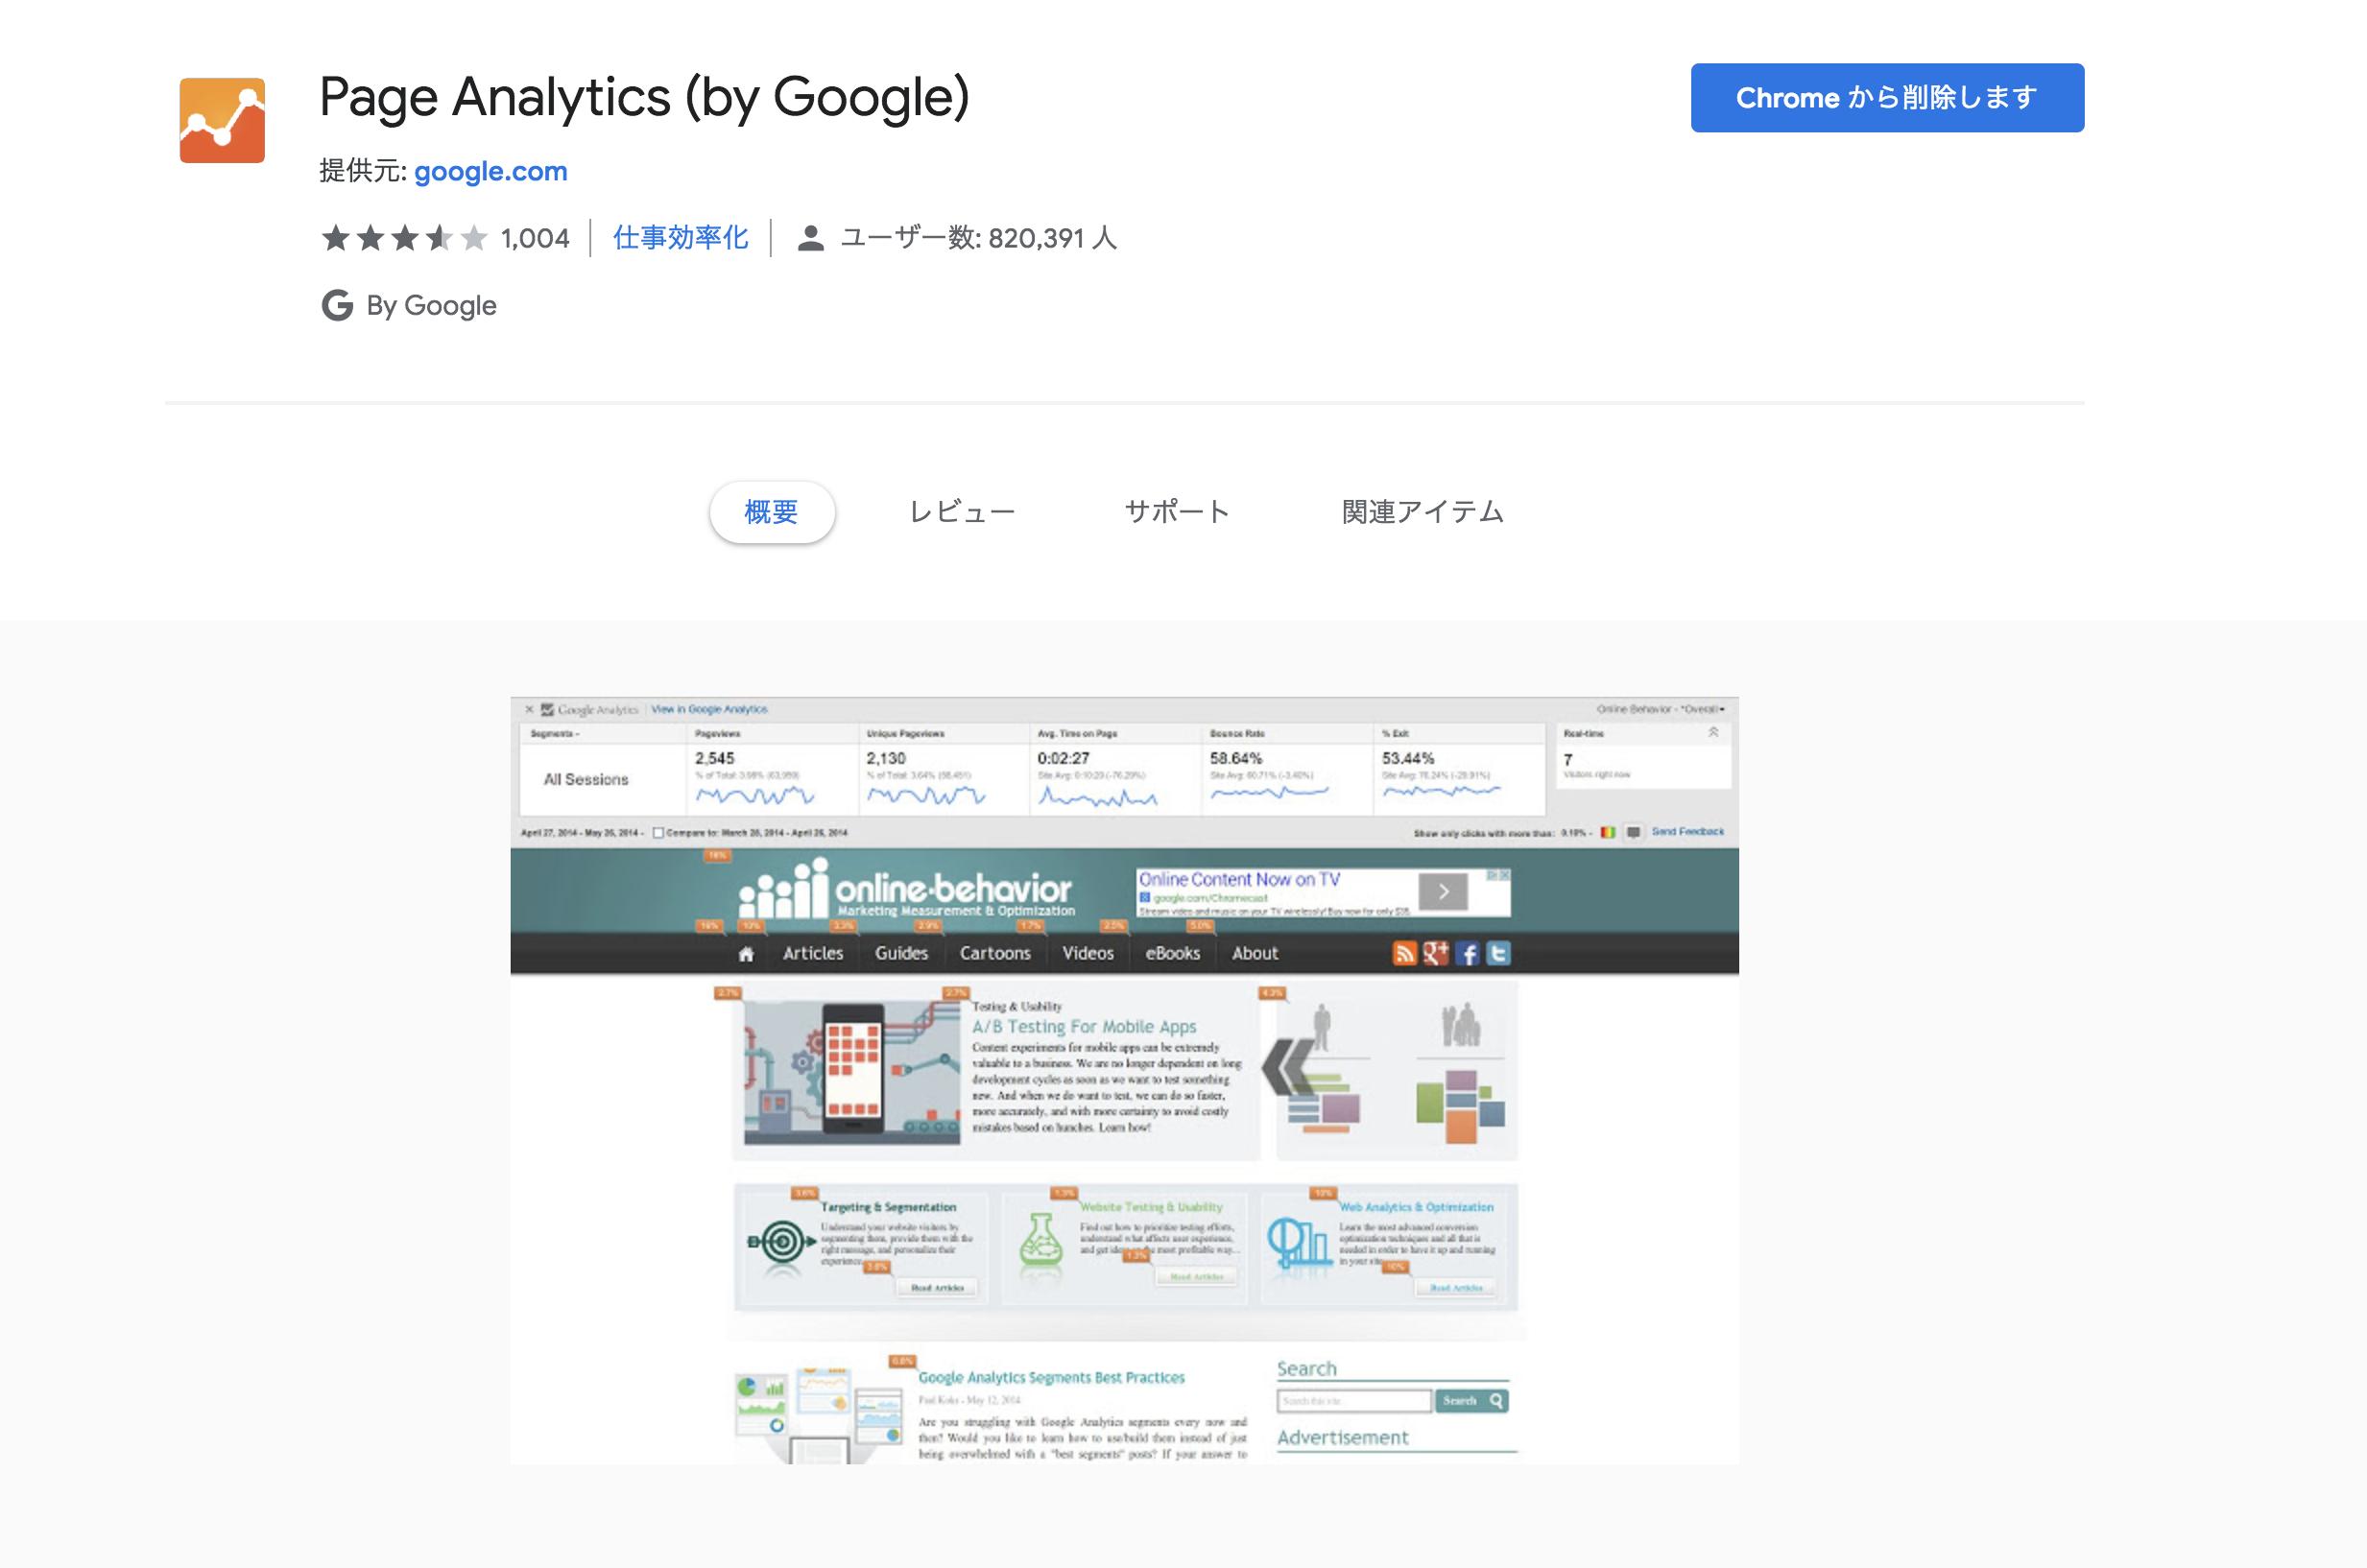 GoogleChrome(グーグルクローム) 拡張機能 Page Analytics